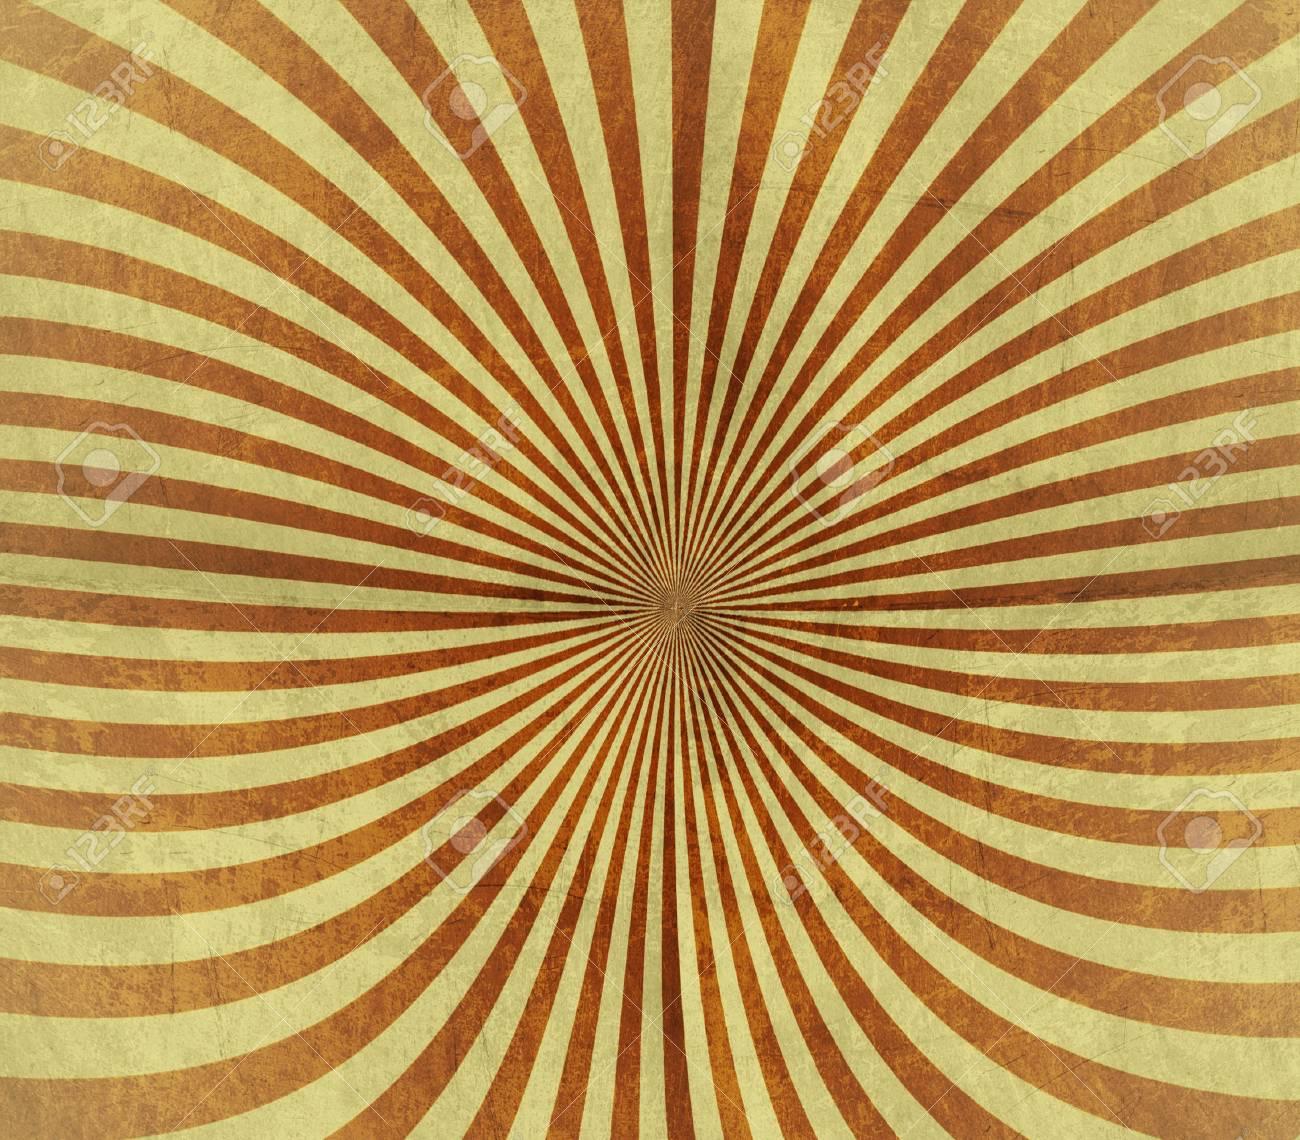 vintage rays pattern background Stock Photo - 7040836